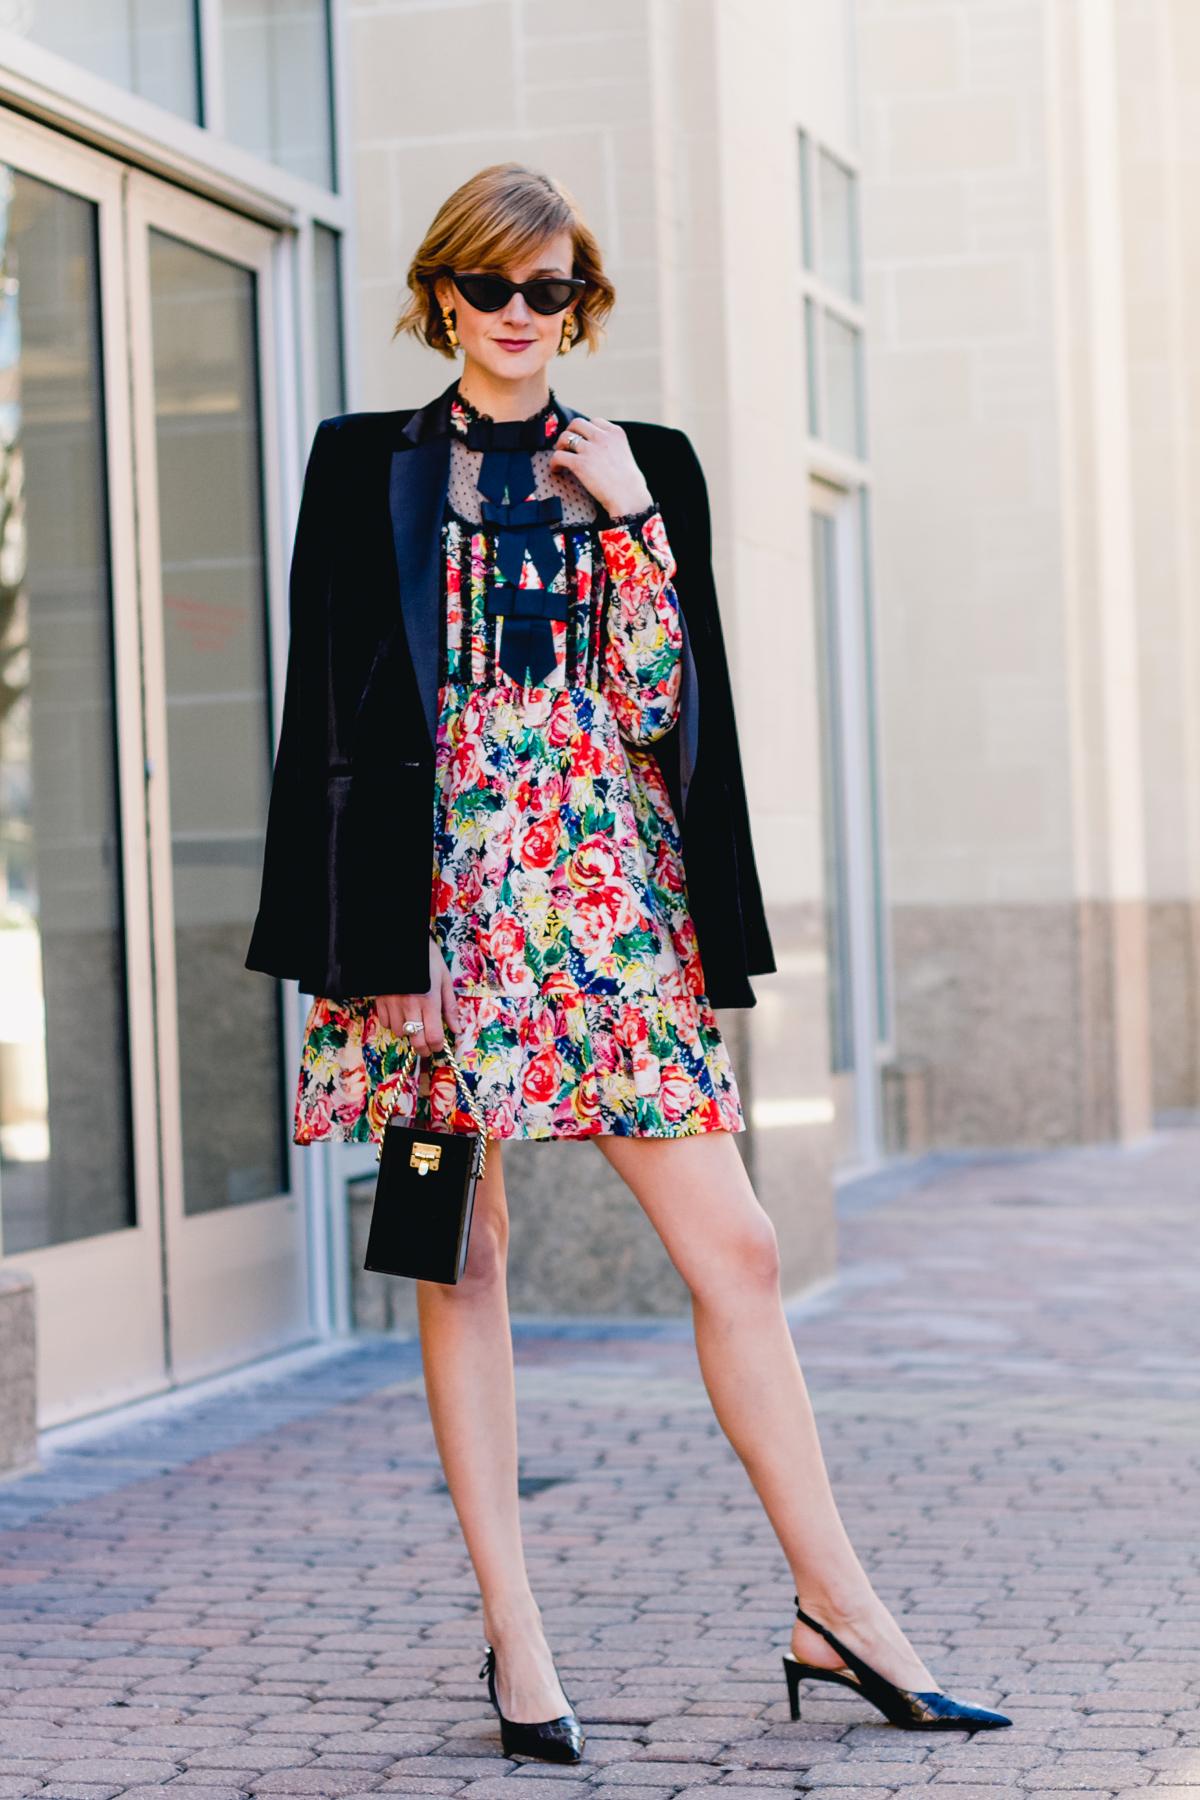 Ganni dress, Mango velvet blazer, and vintage bag